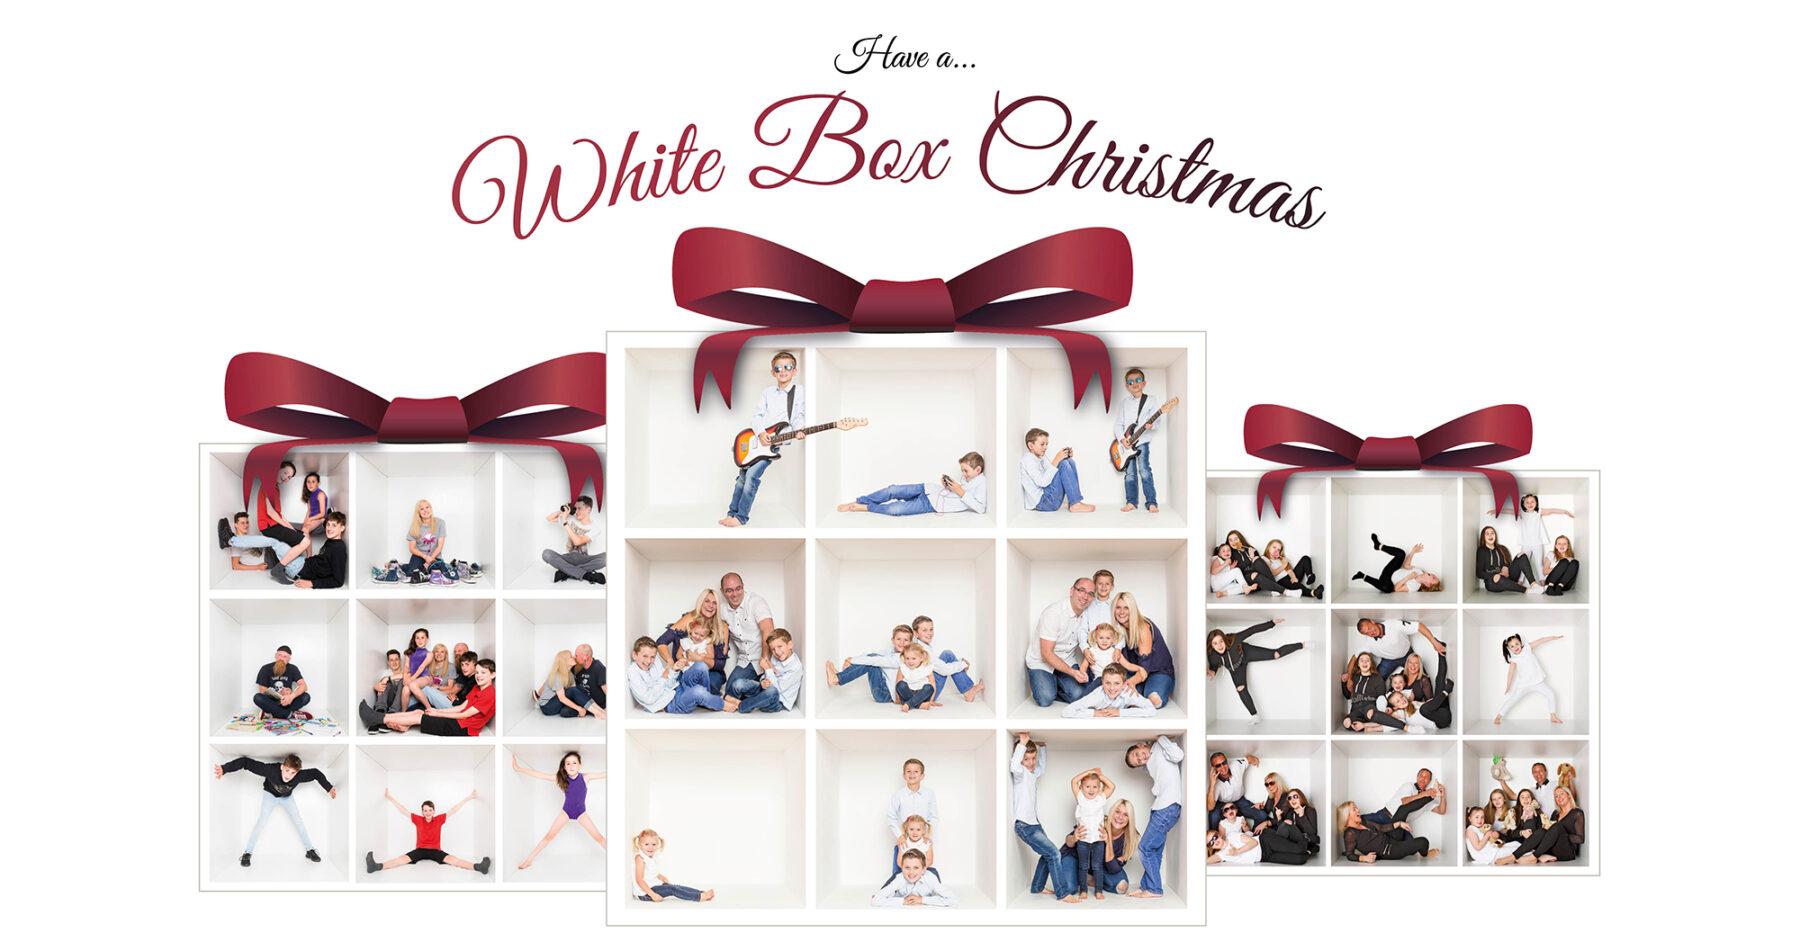 Brighton Photographer - the white box Christmas offer